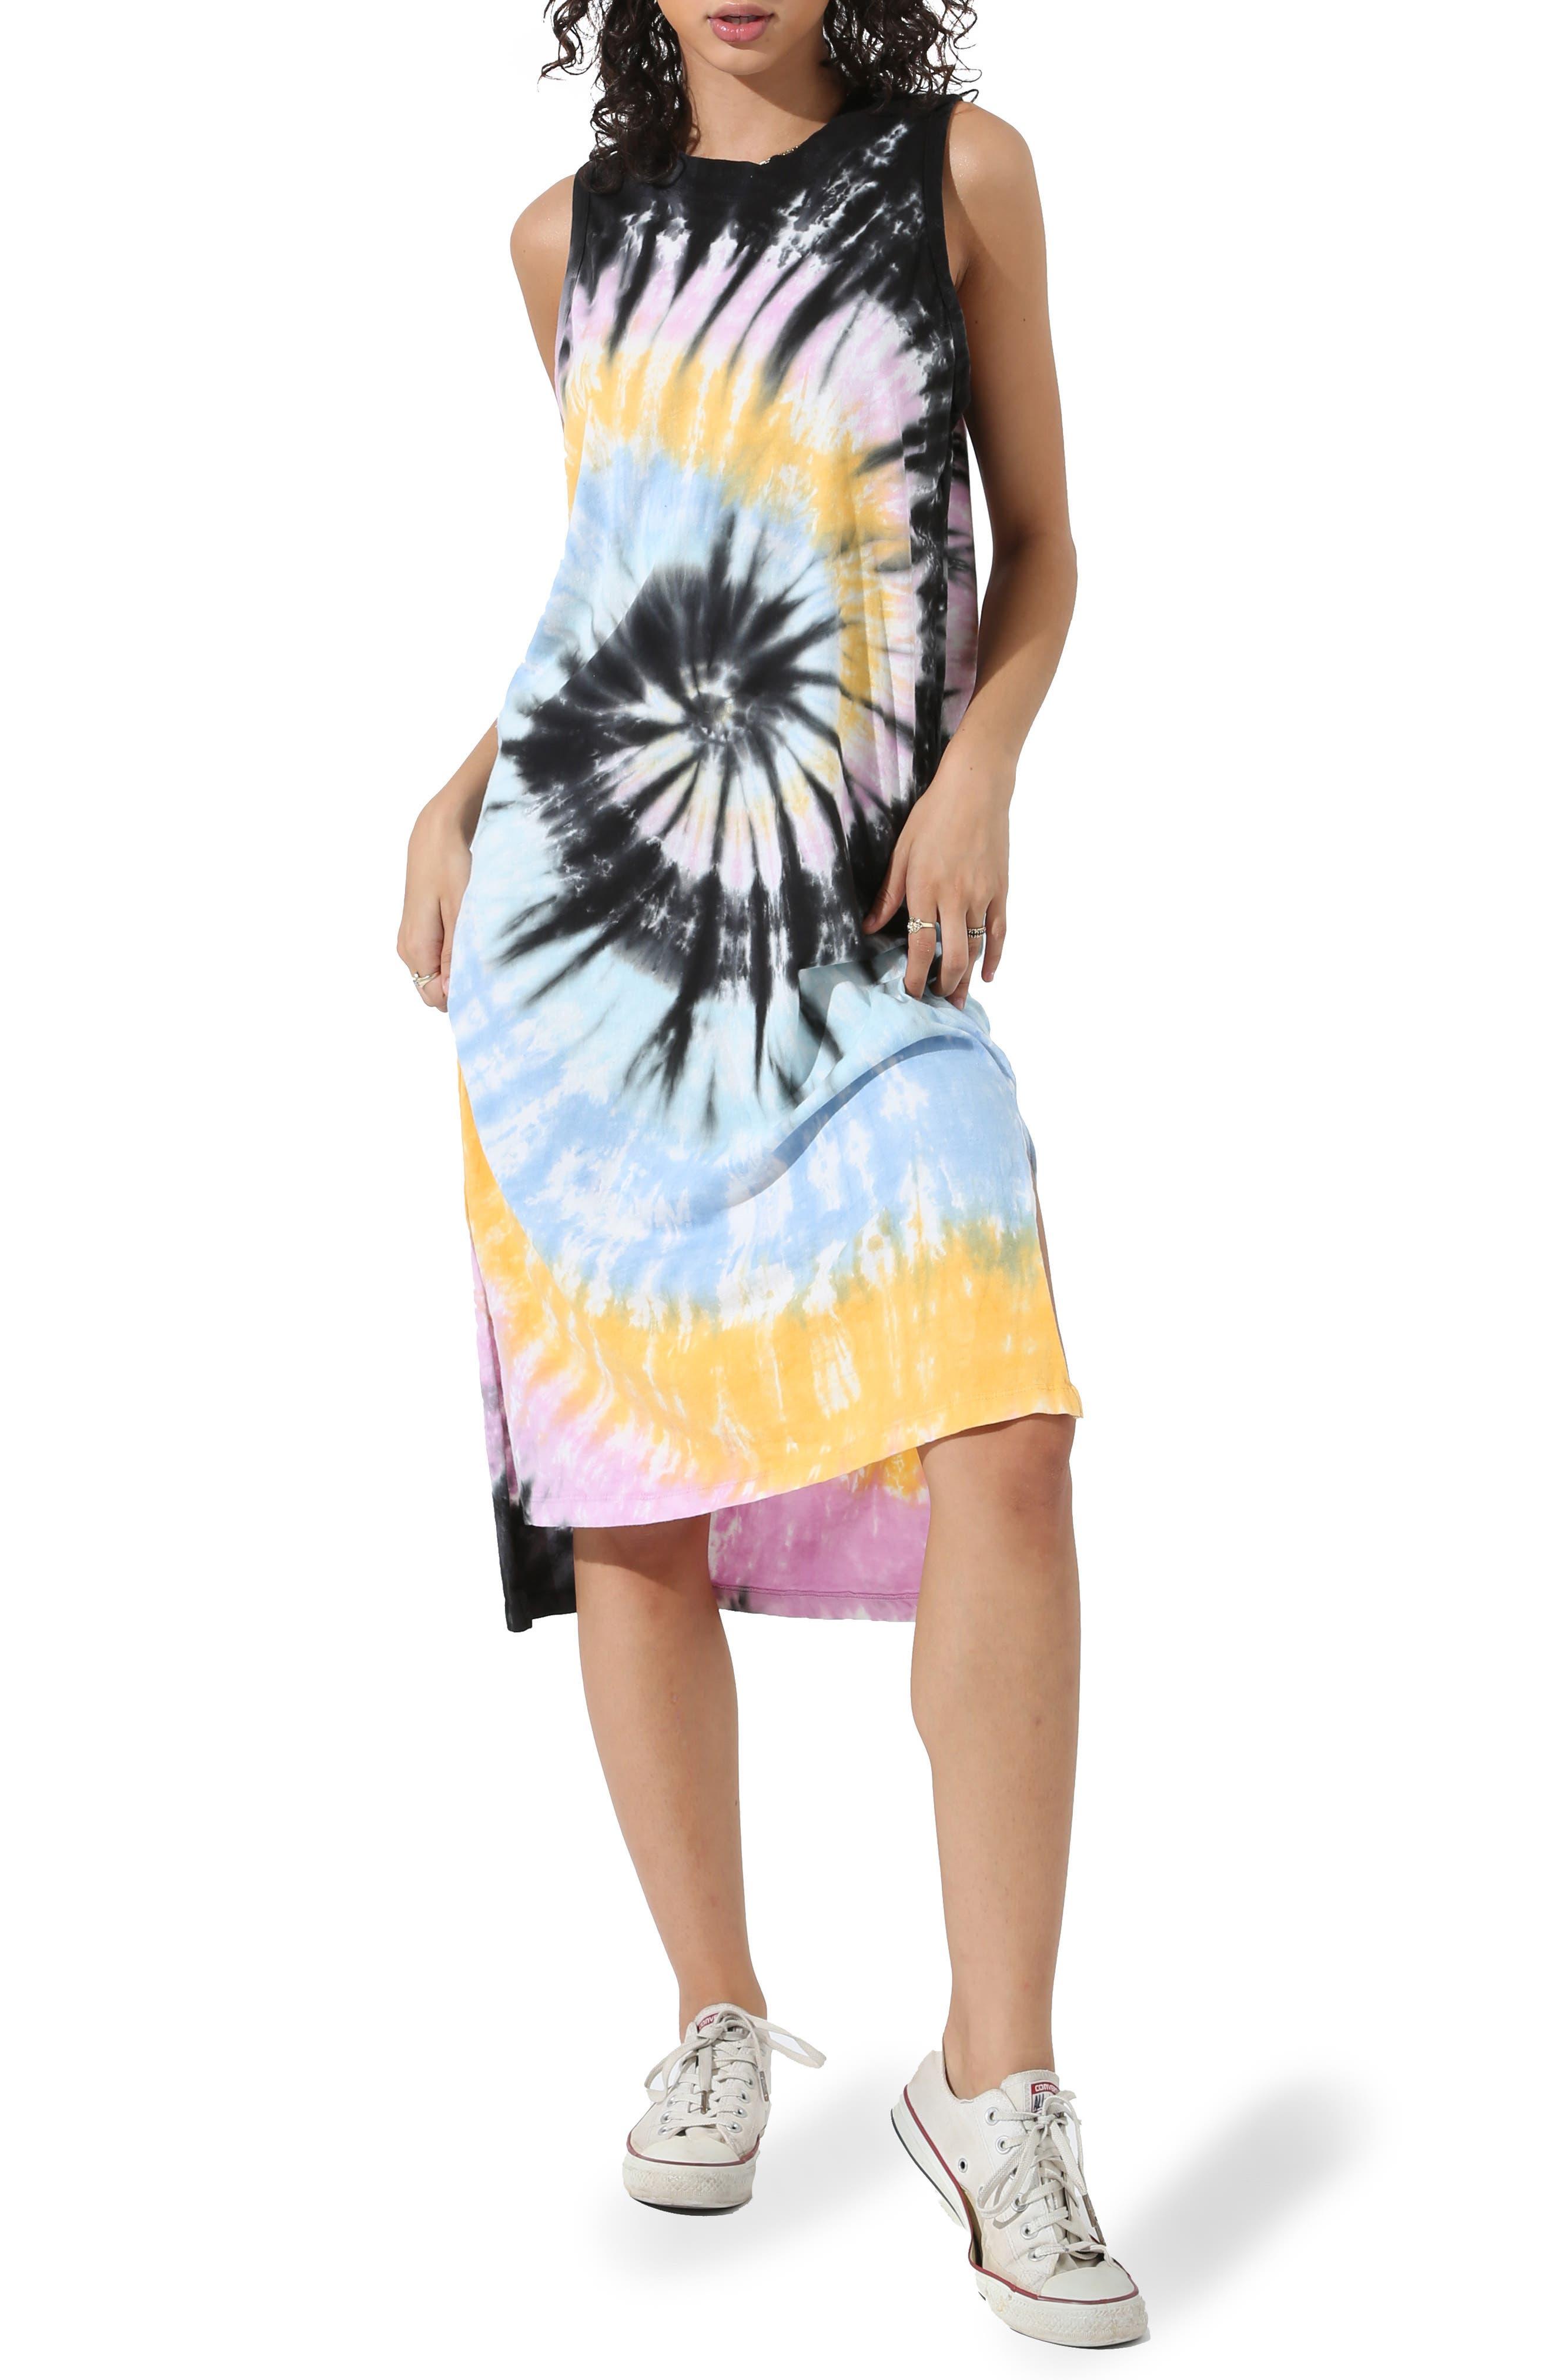 Posey Vibe Sleeveless Dress